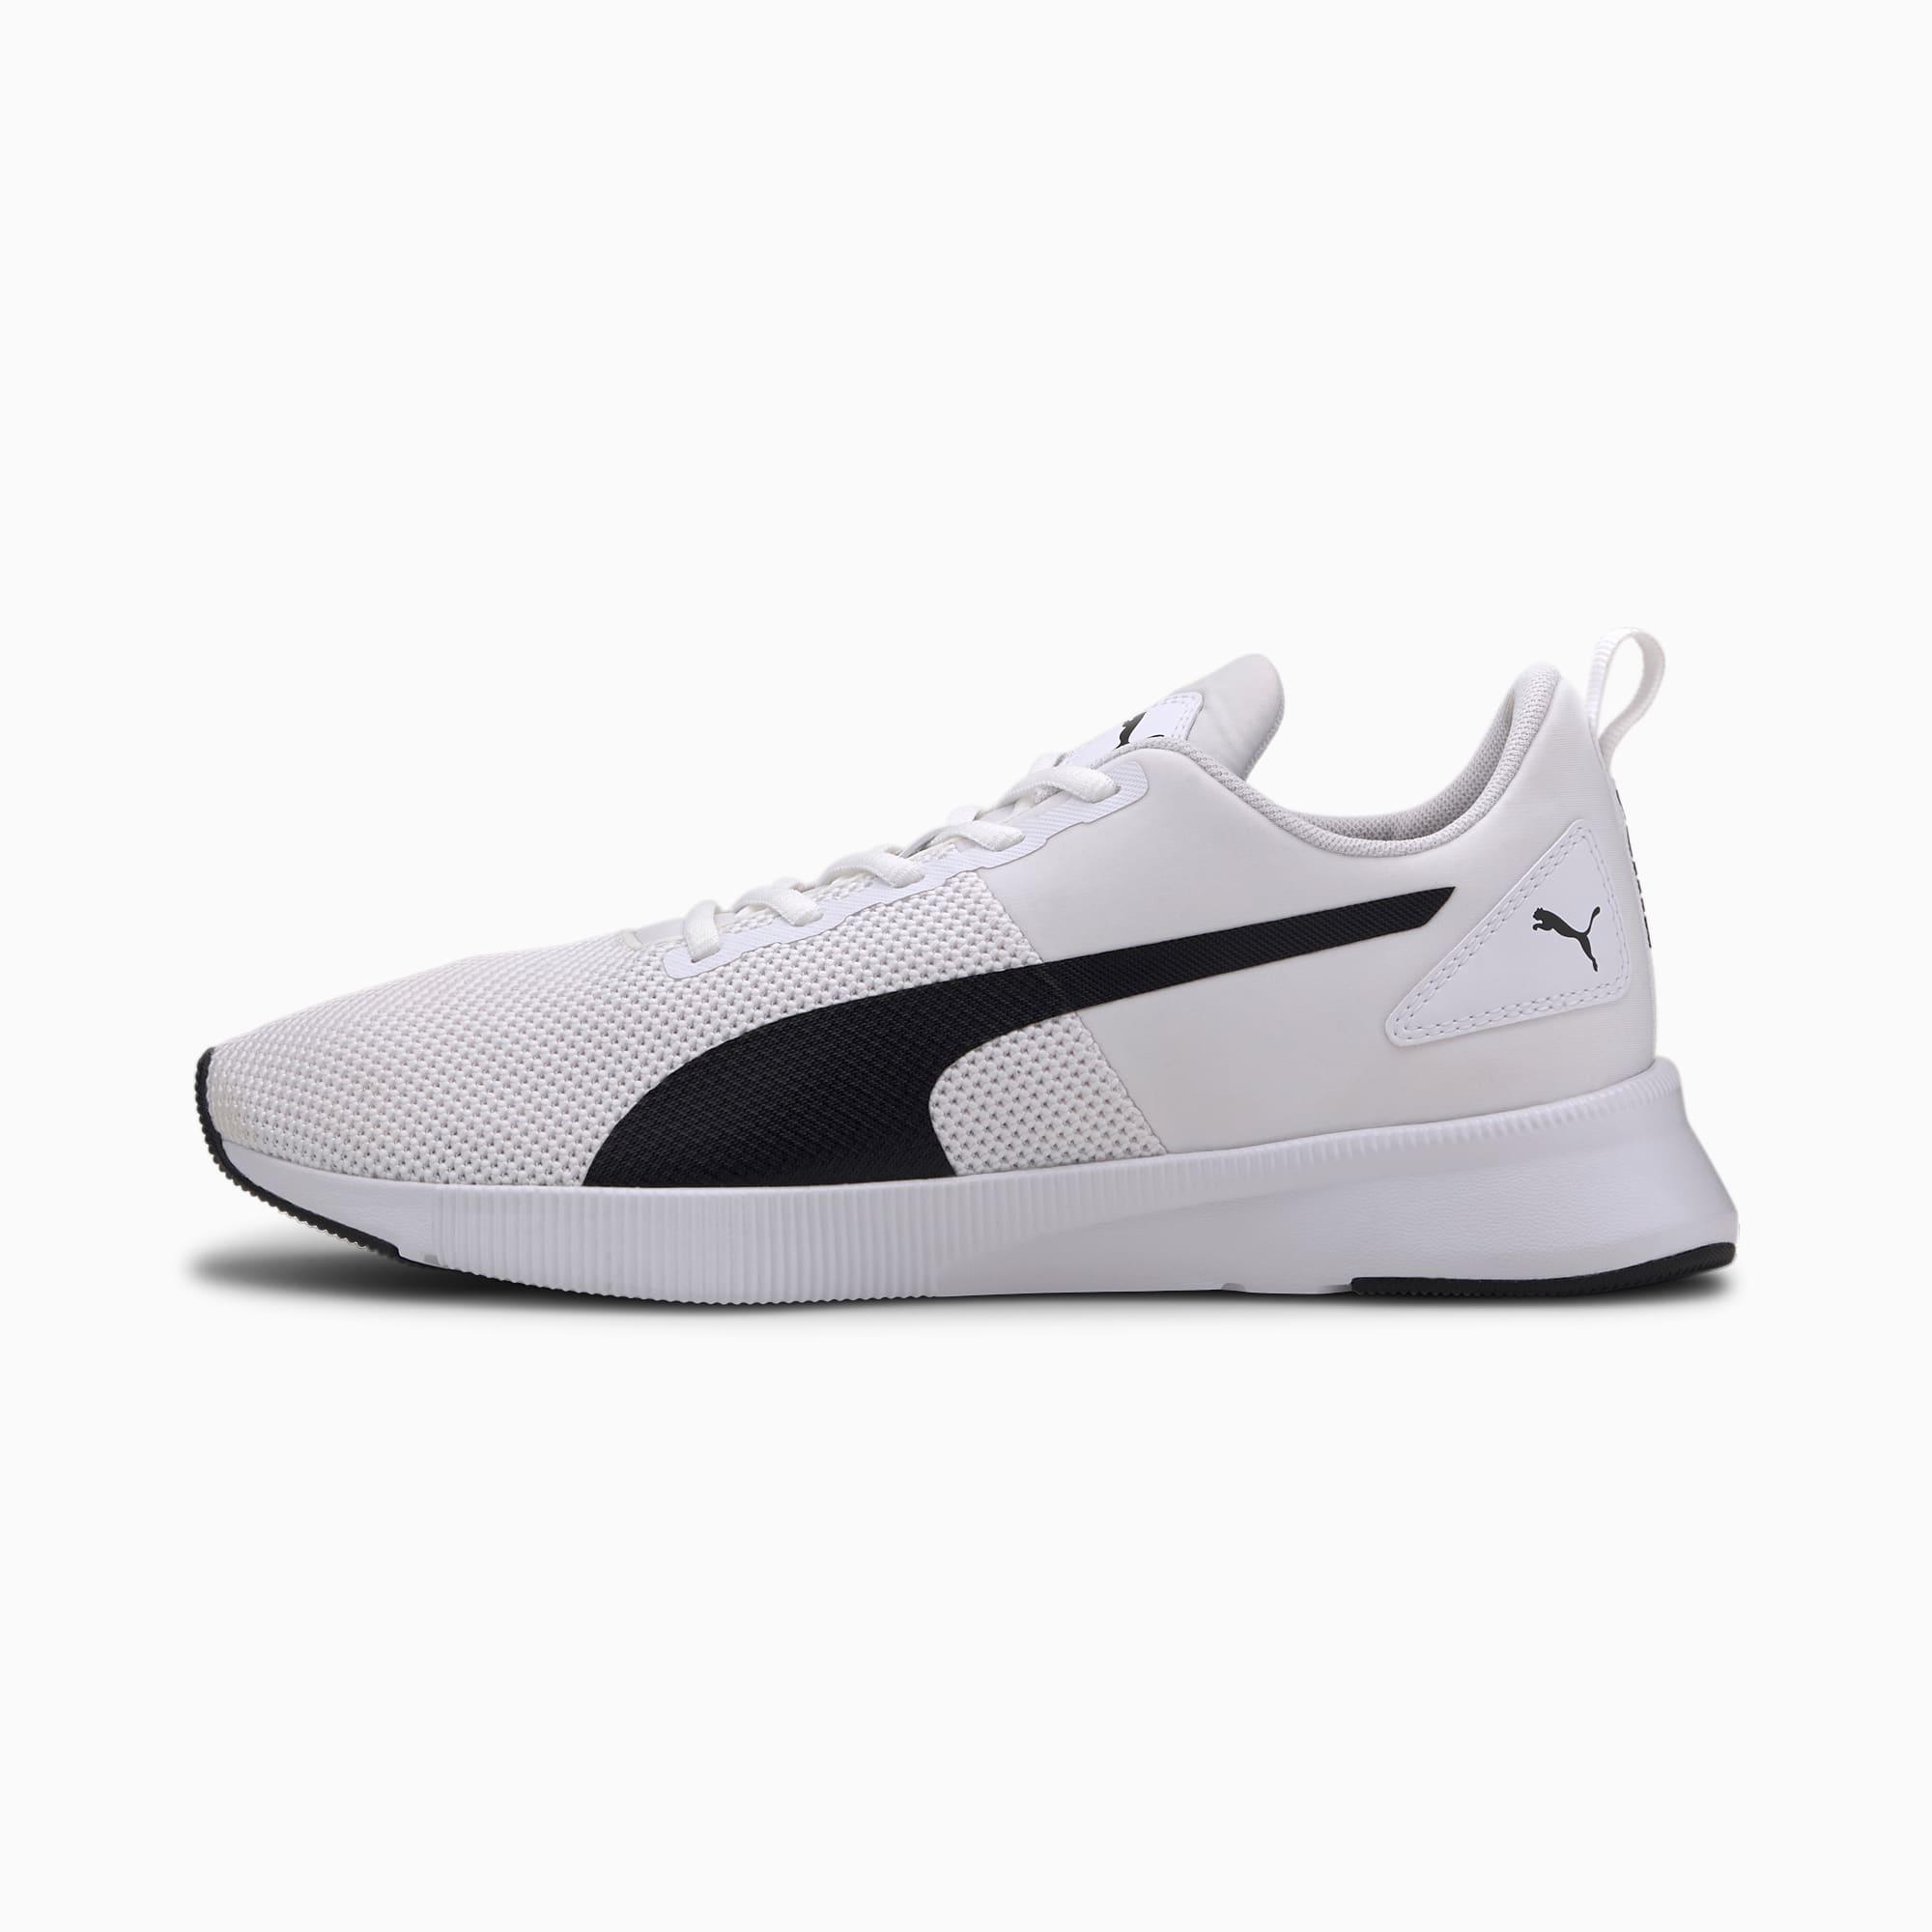 PUMA Chaussure de course Flyer Runner, Blanc/Noir, Taille 37, Chaussures